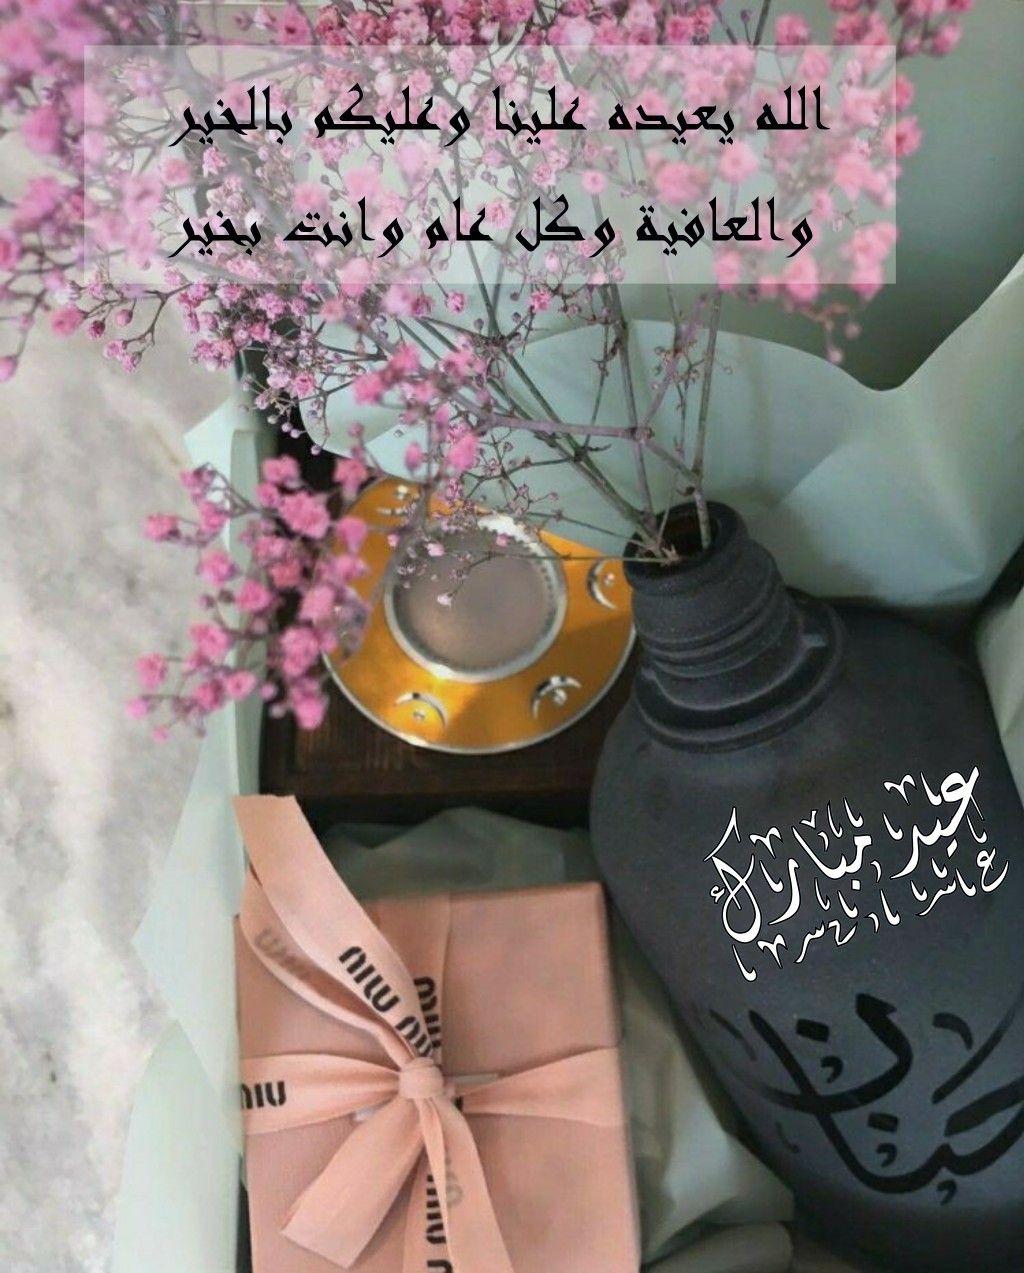 Pin By سكينة الحبشي On عيد مبارك وكل عام وانتم بخير Eid Cards Eid Mubarak Pink Flowers